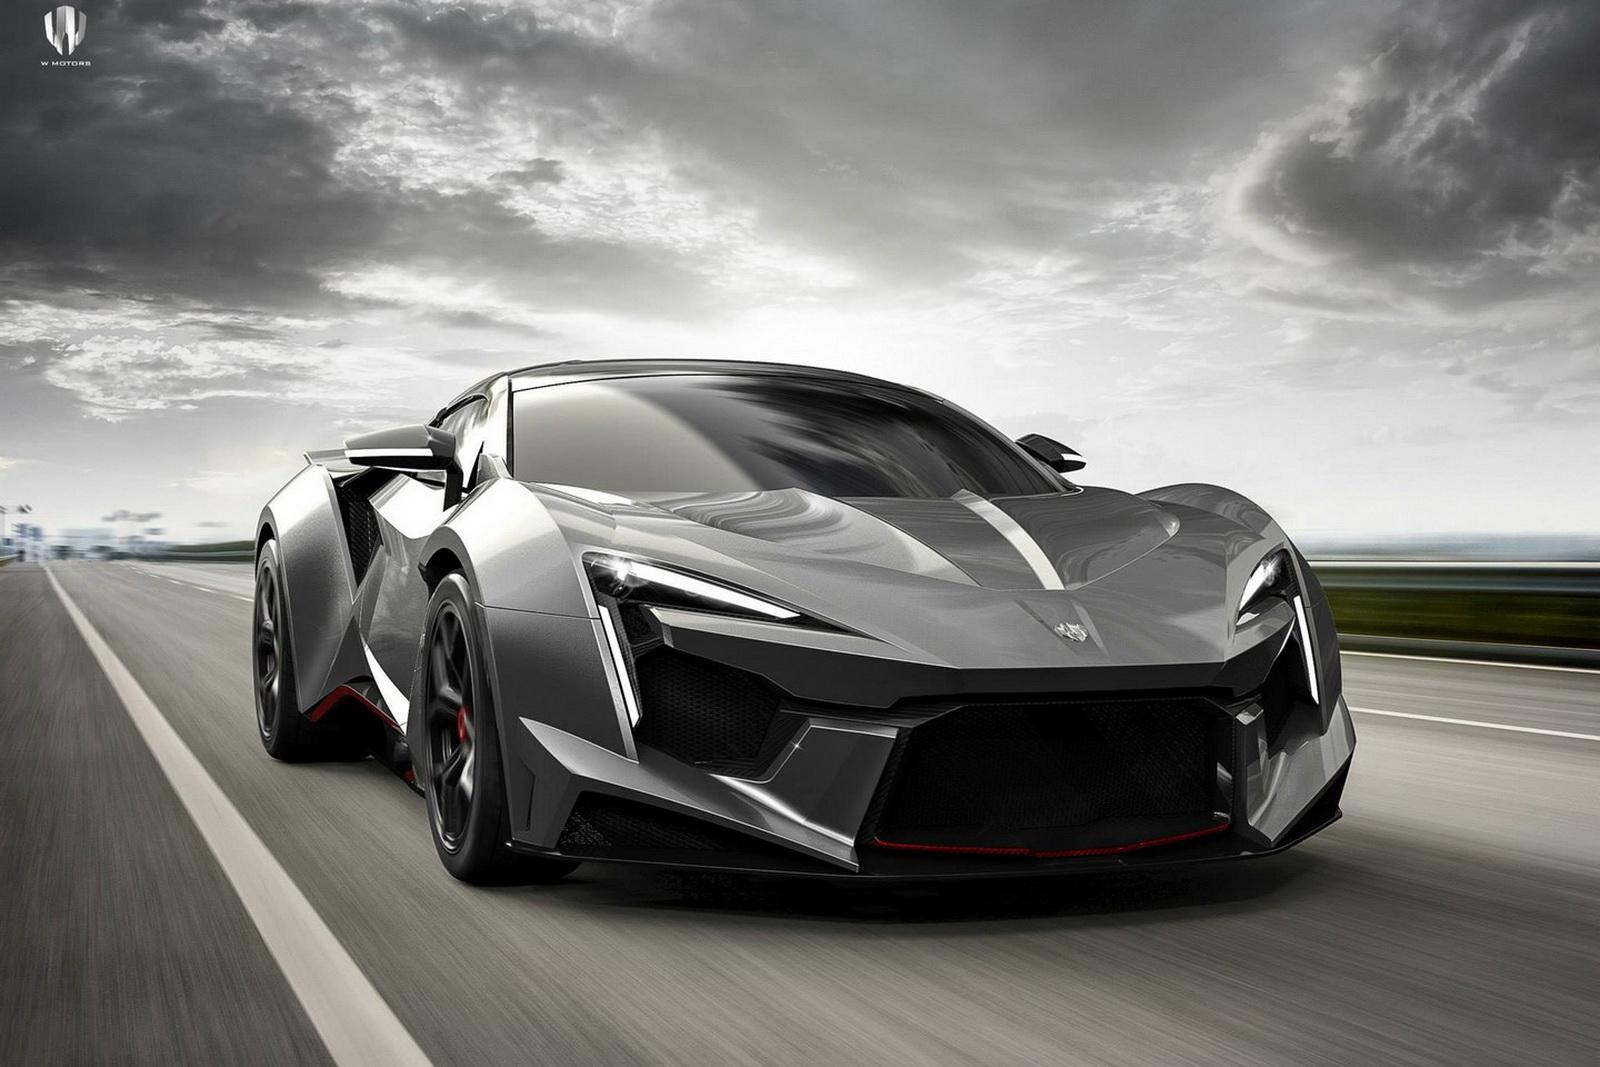 W Motors Fenyr Supersport 2015 - now Coupe #5